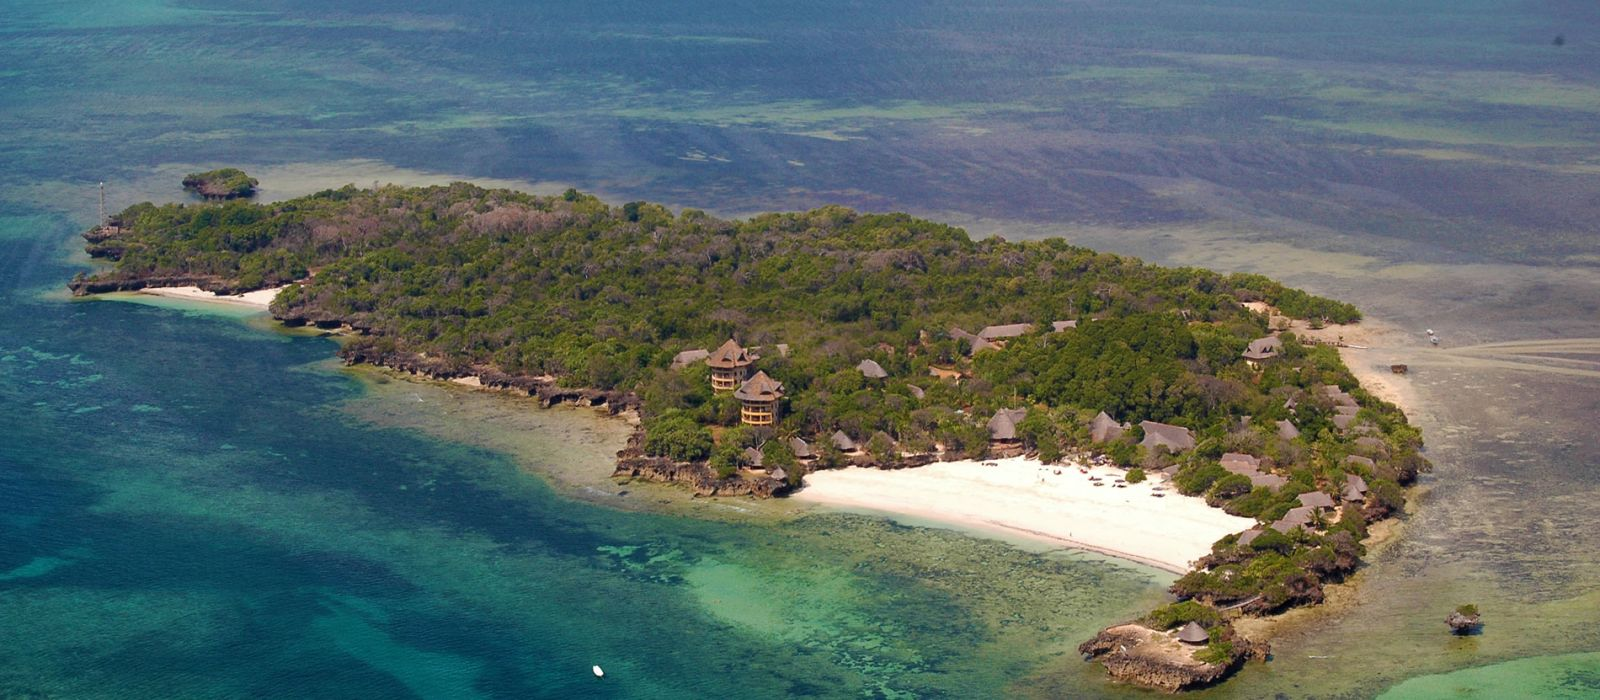 Destination Chale Island Kenya